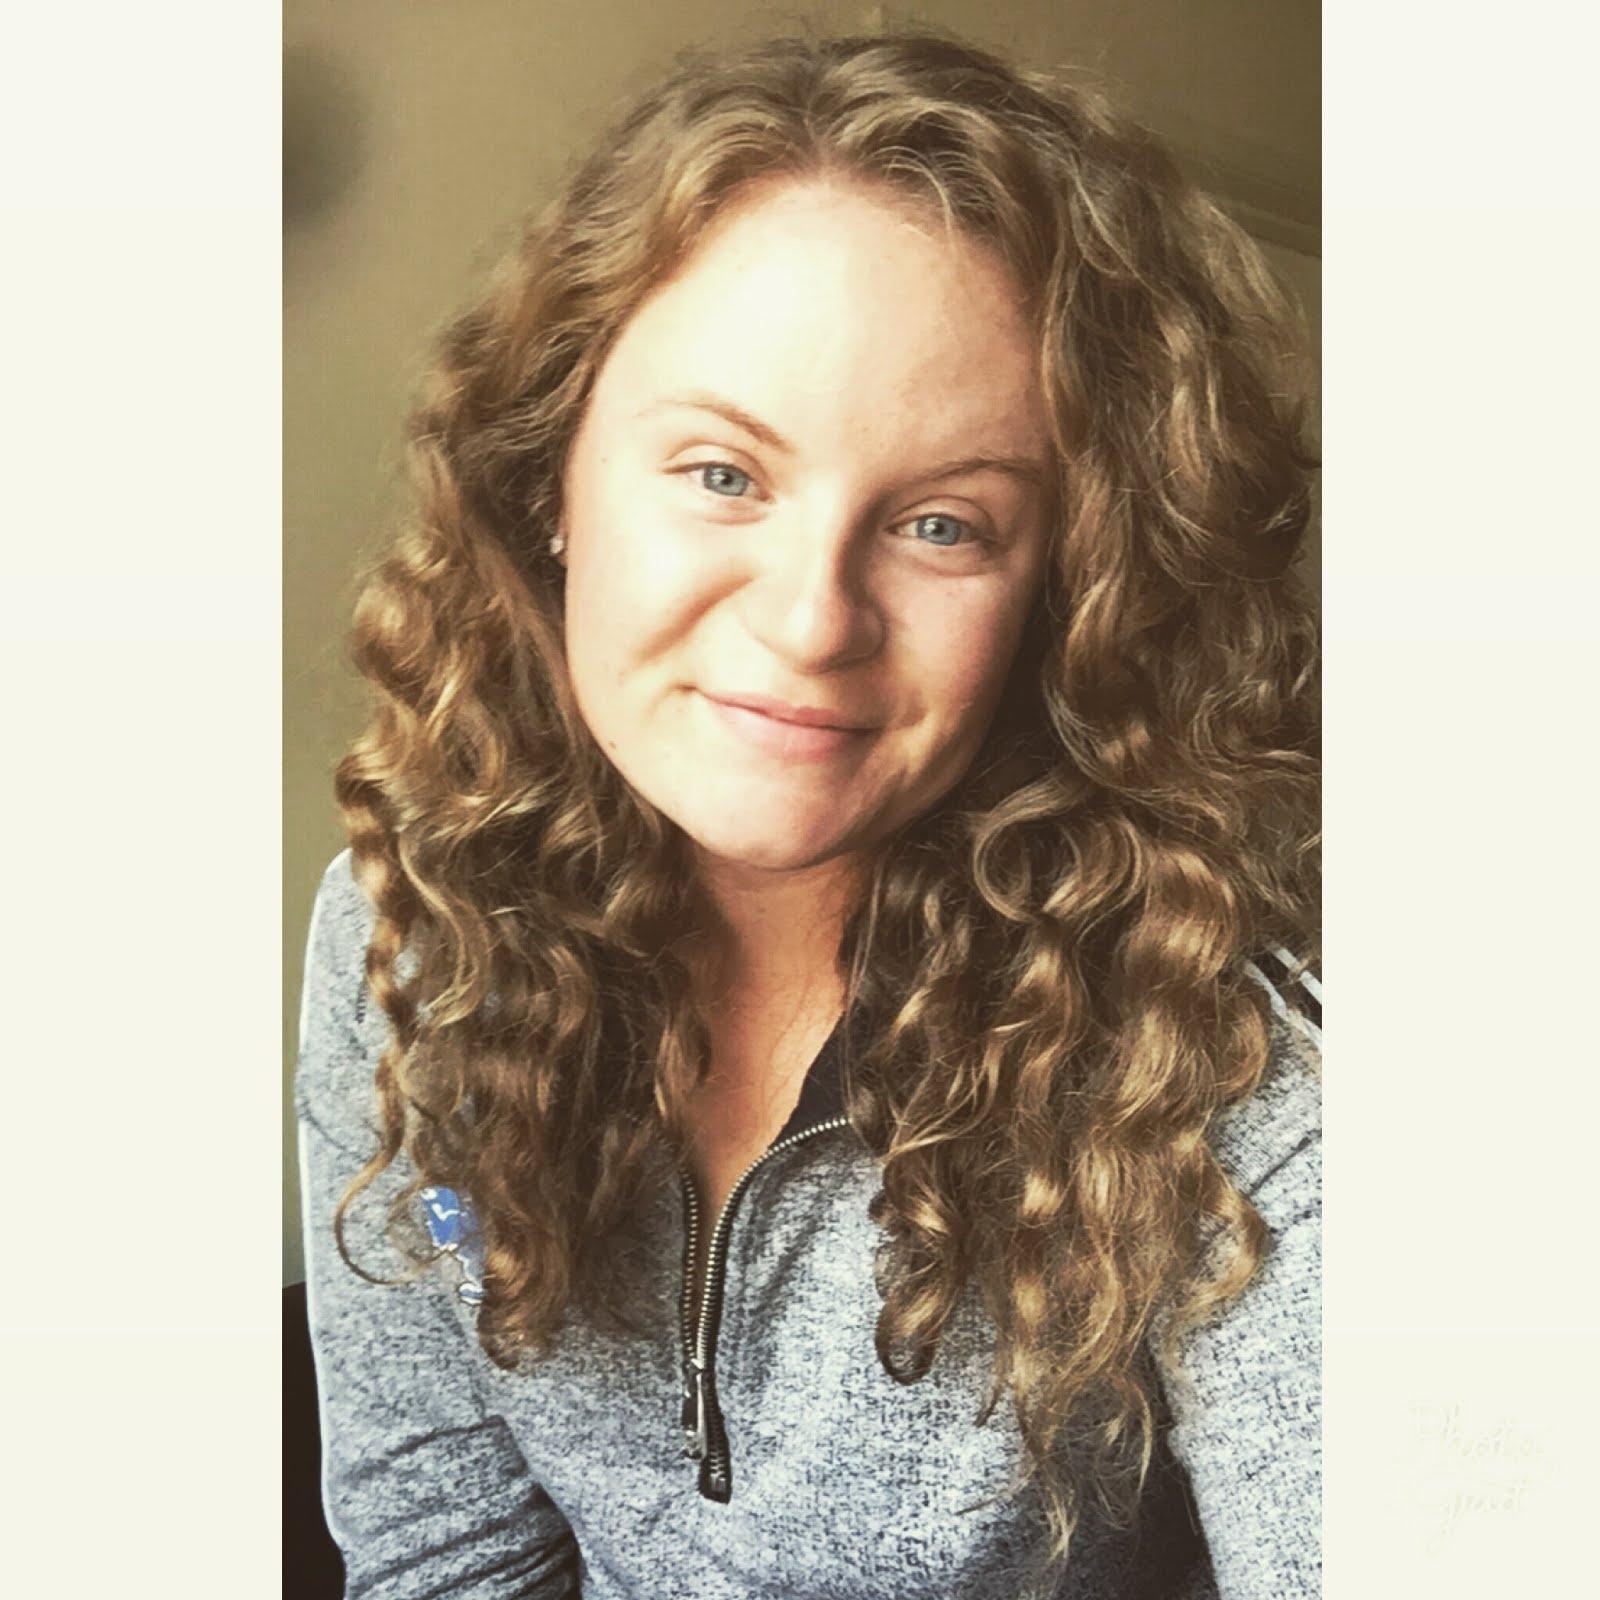 Intern: Natalie Woodley